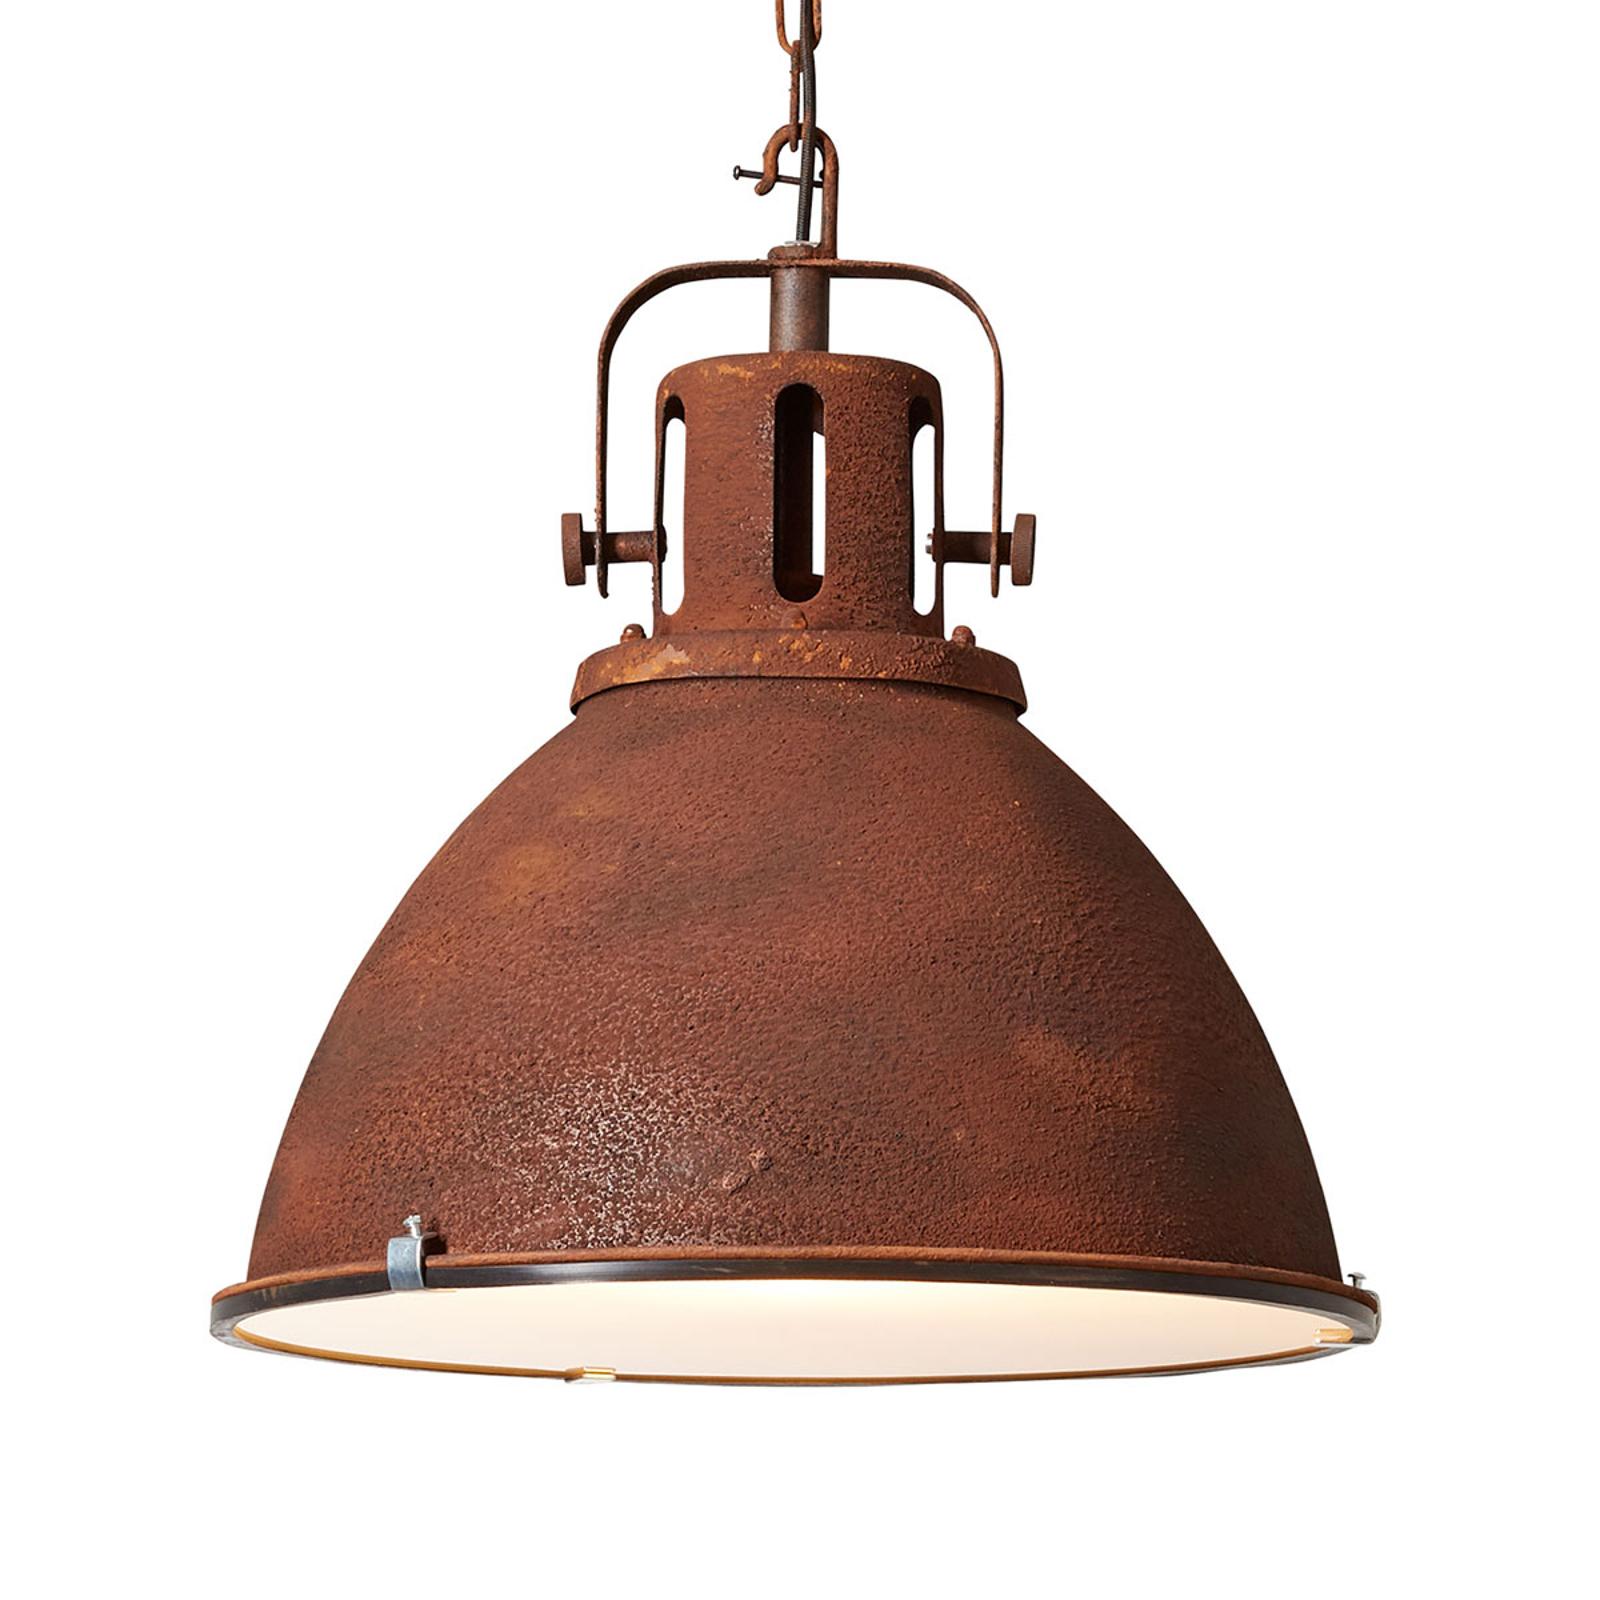 Lampada a sospensione Jesper, stile industriale